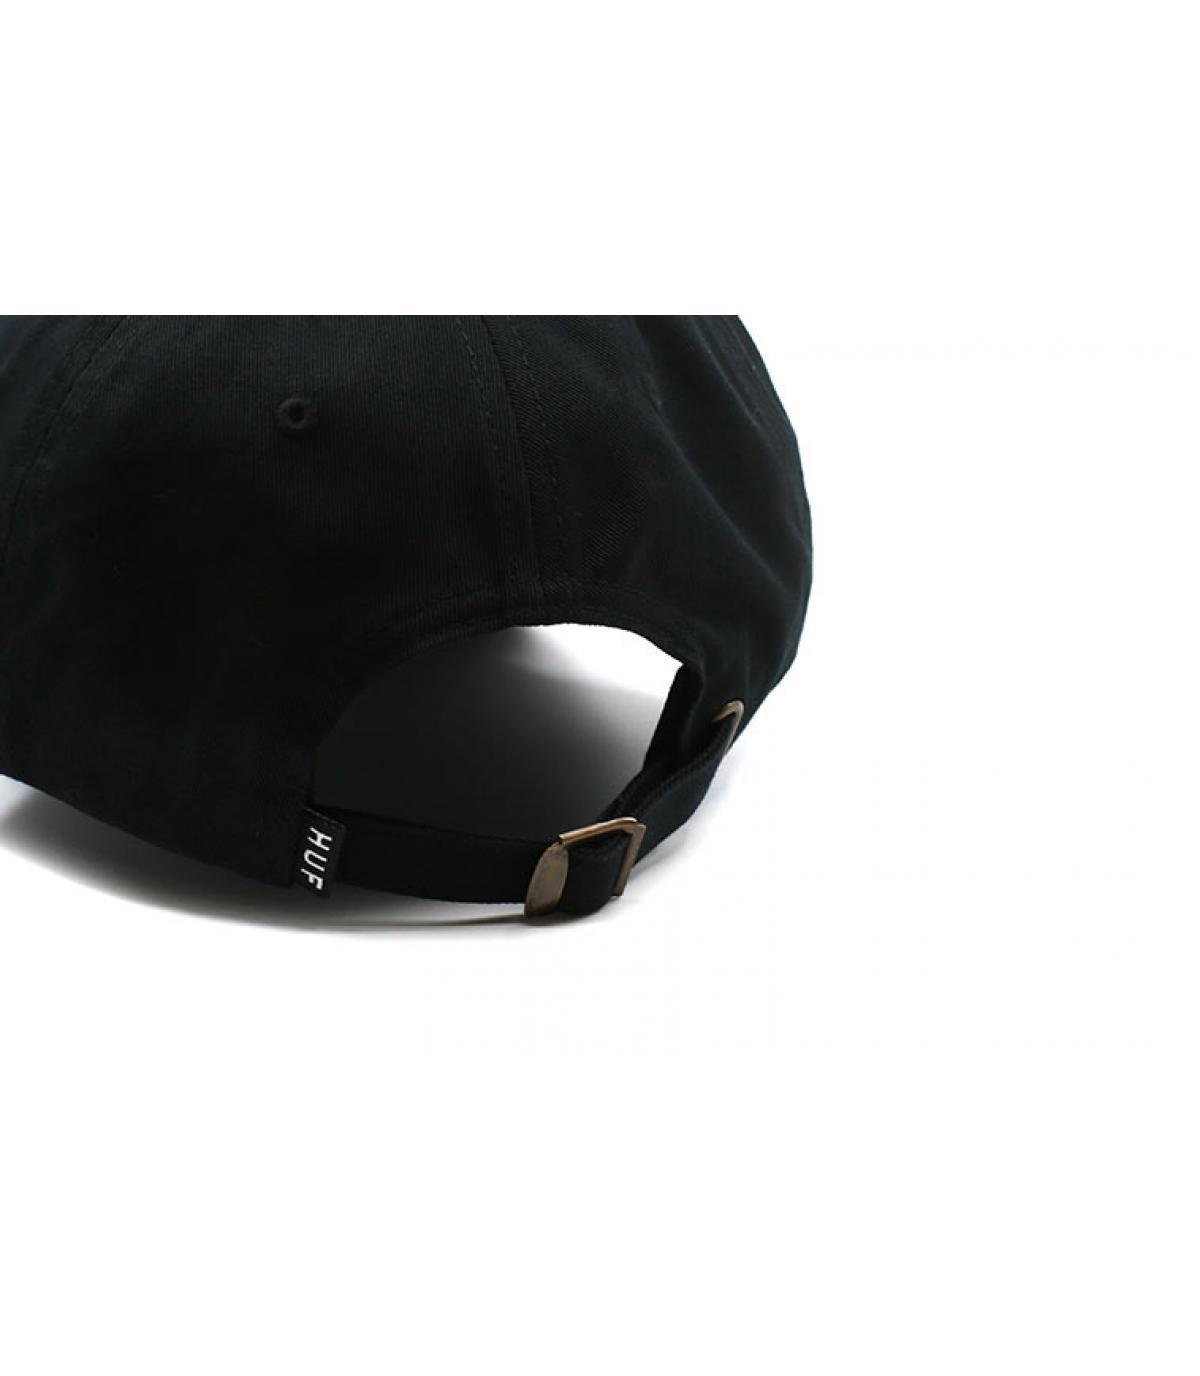 Details Curve Sedona black - Abbildung 5